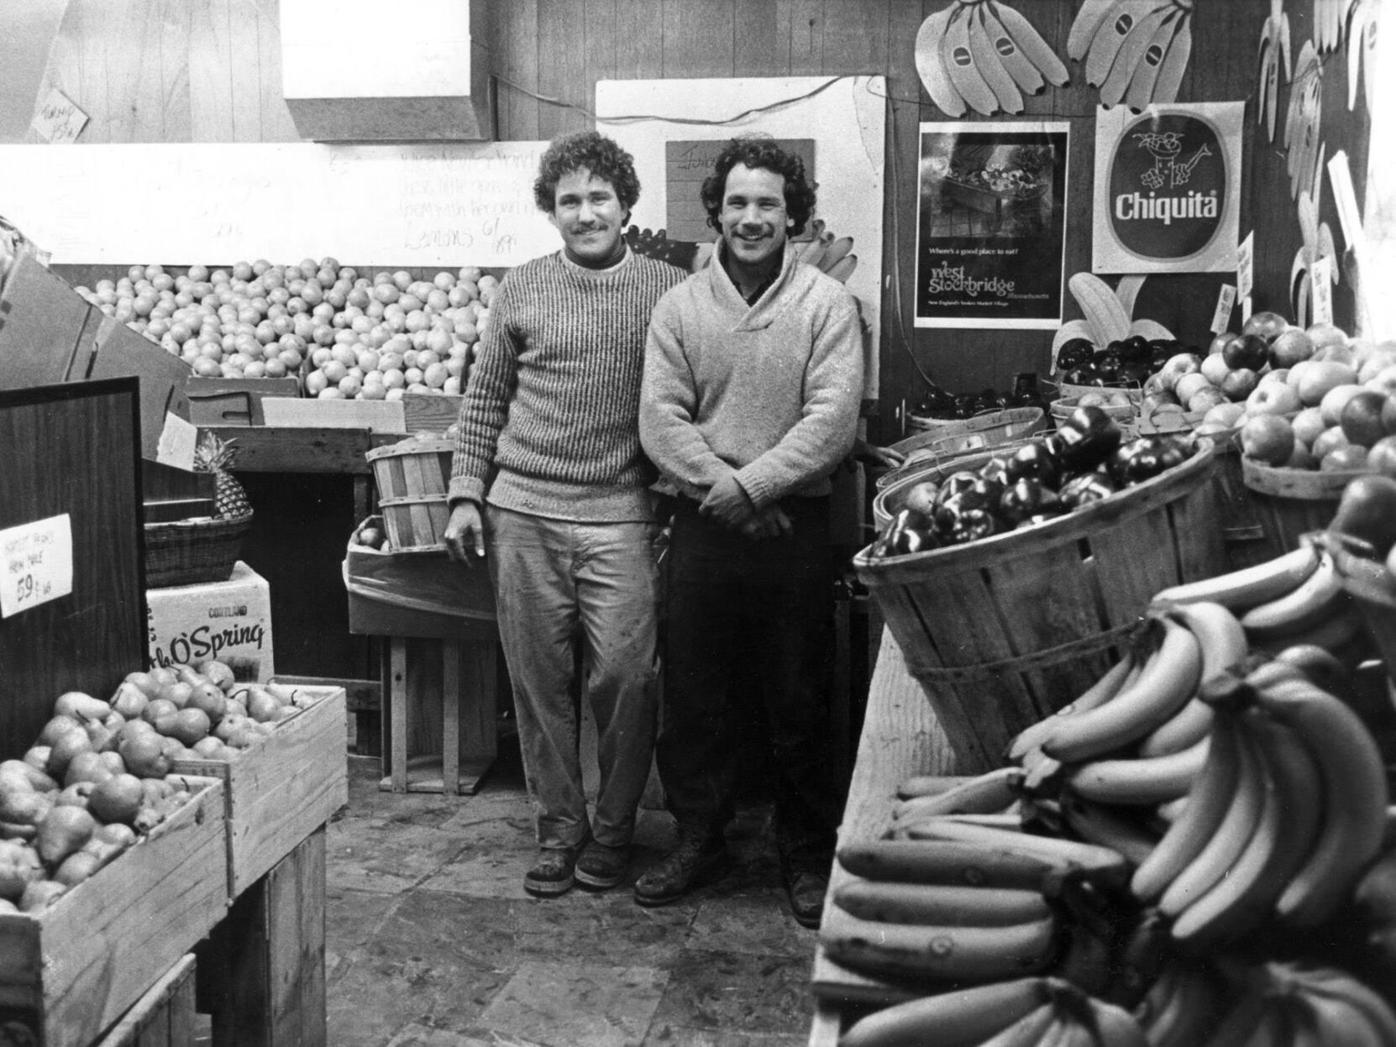 Matt and Chris Masiero in their original produce stand